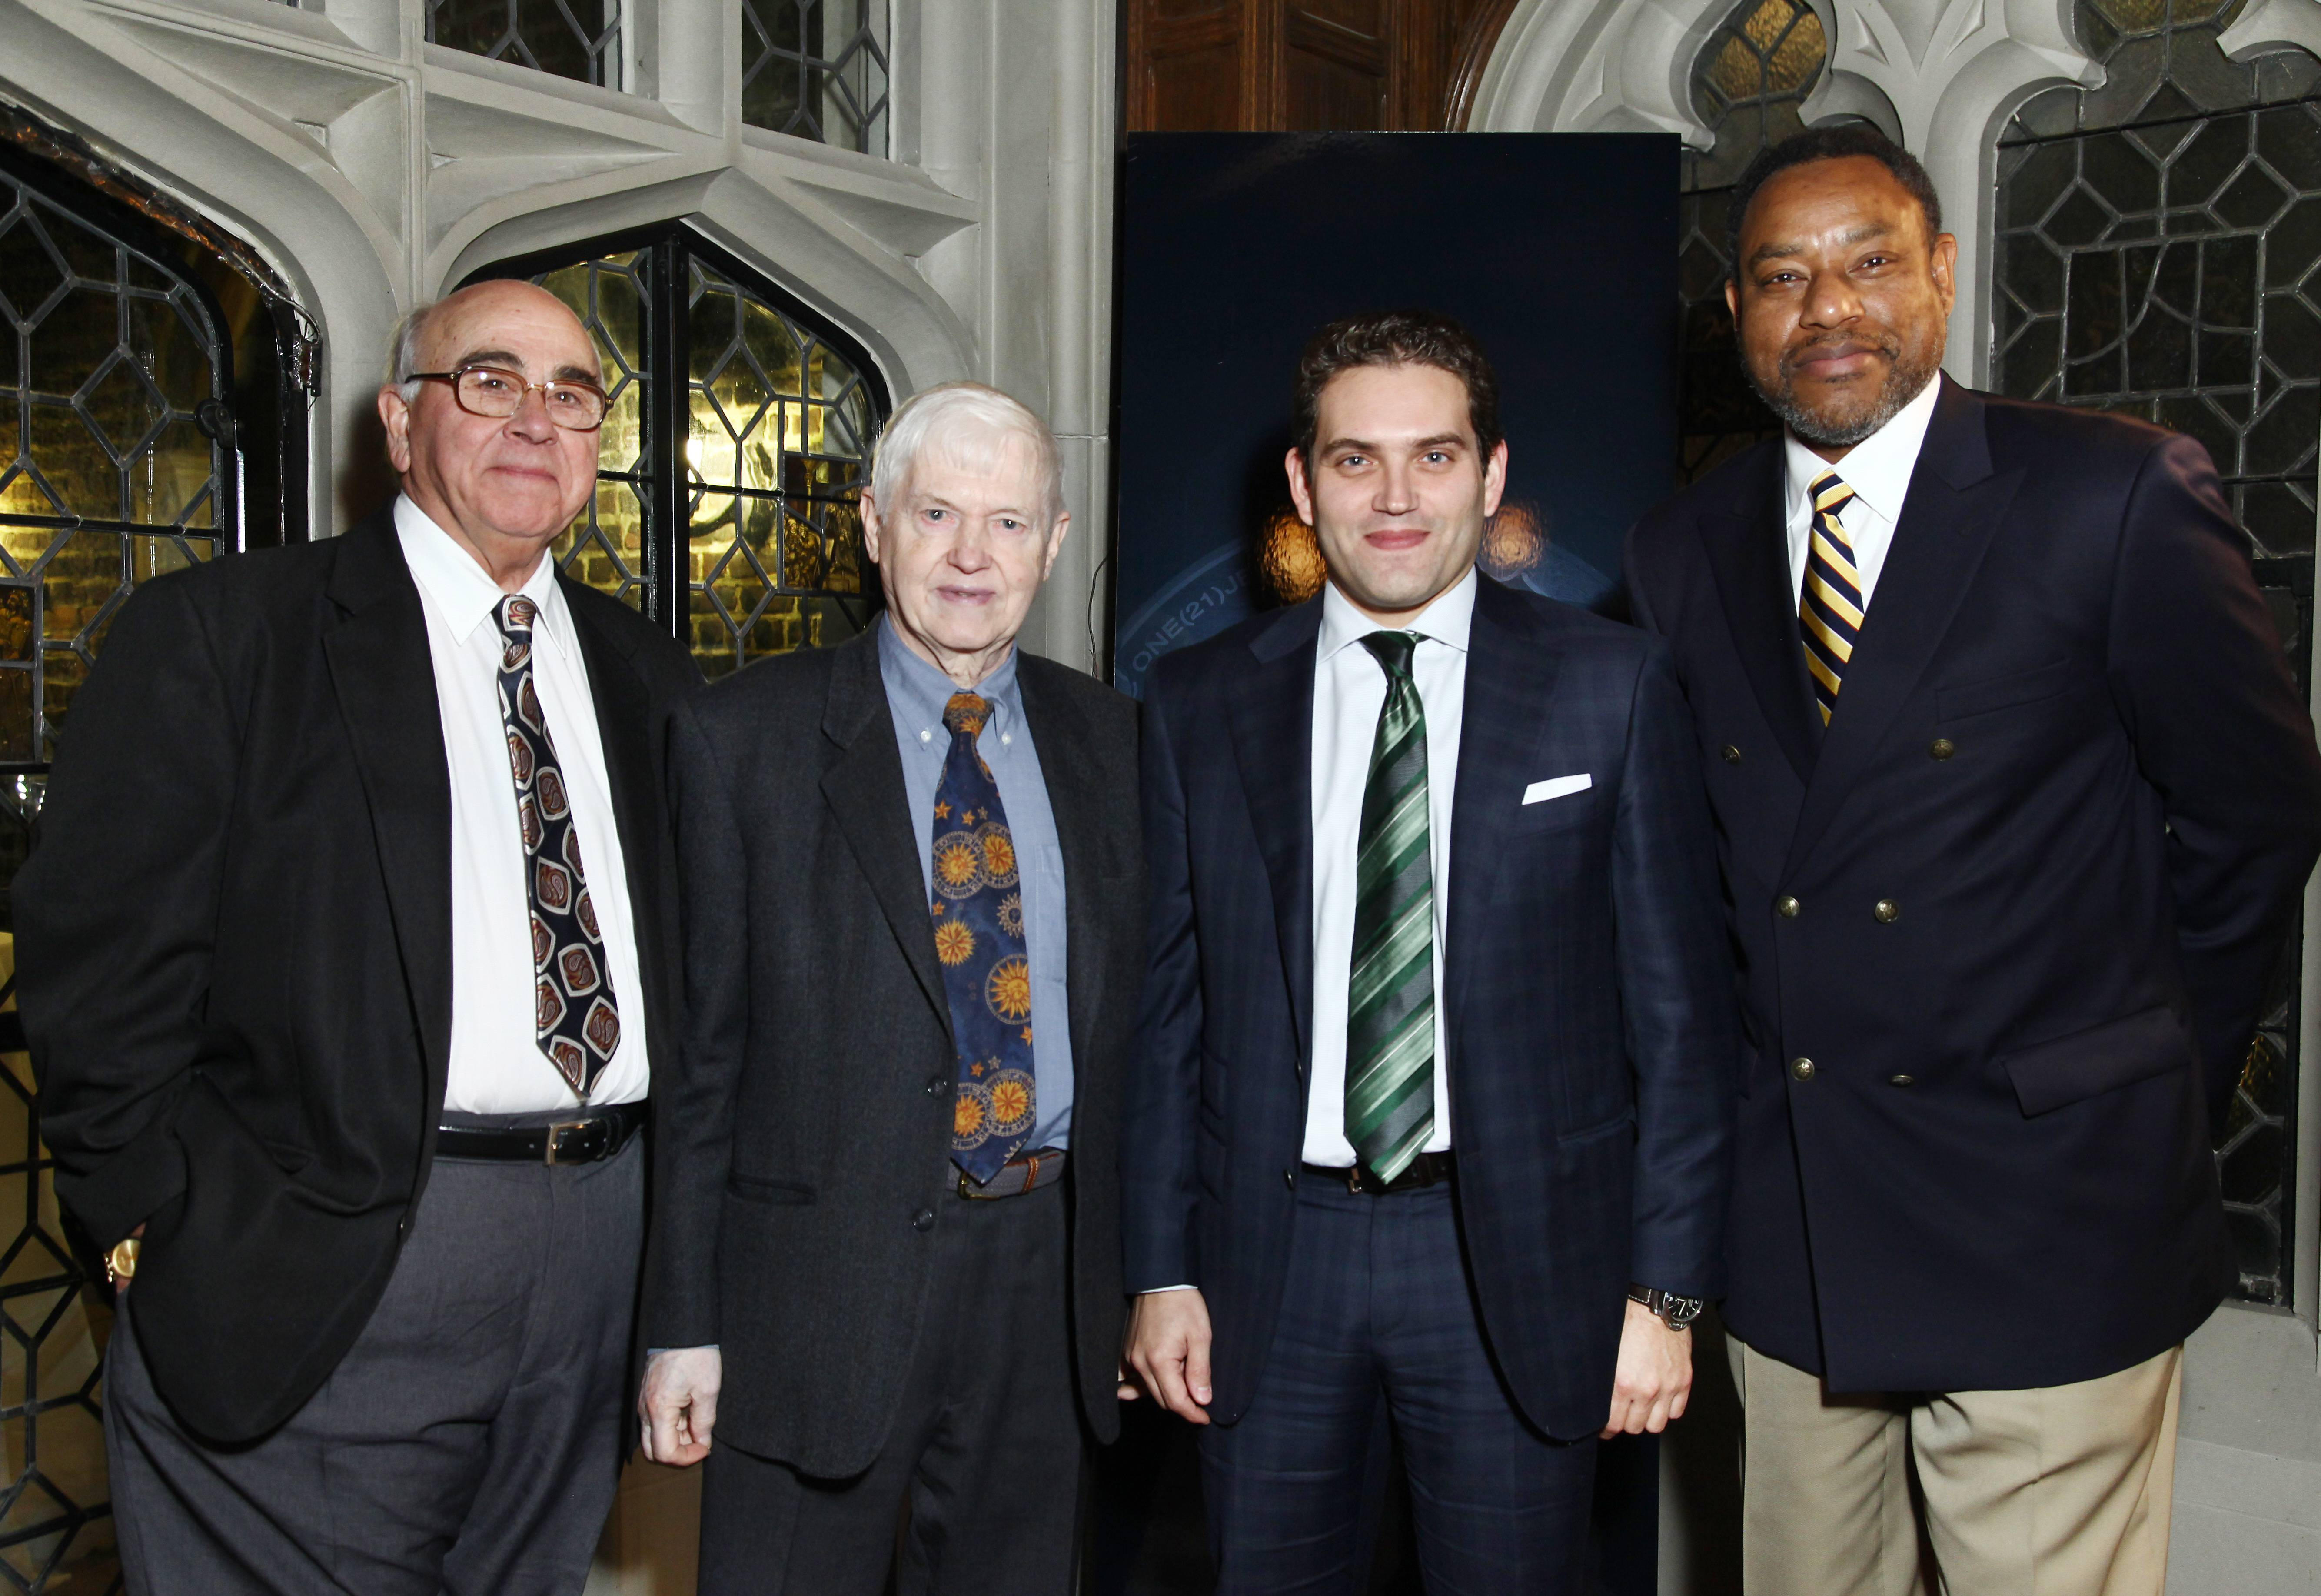 Dr. Anthony Aveni, Dr. Owen Gingerich, Panerai North America President Rafael Alvarez, Dr. Derrick Pitts